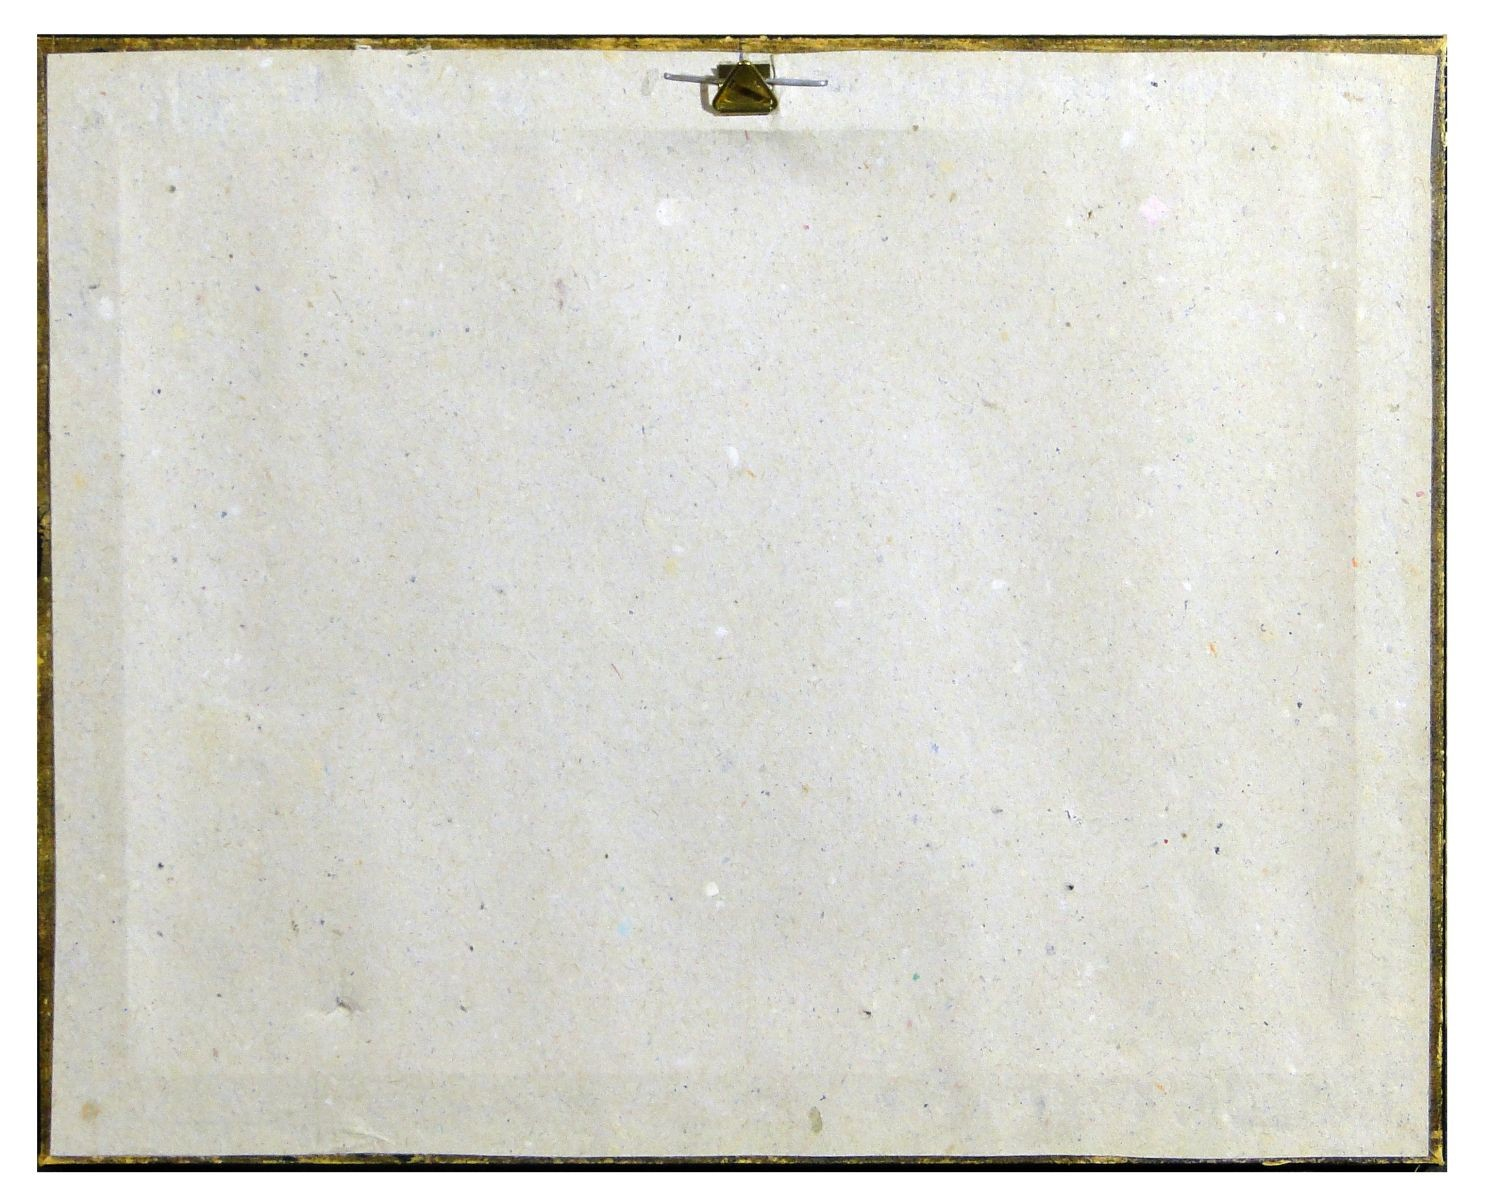 DSC07557.JPG (1491×1200)